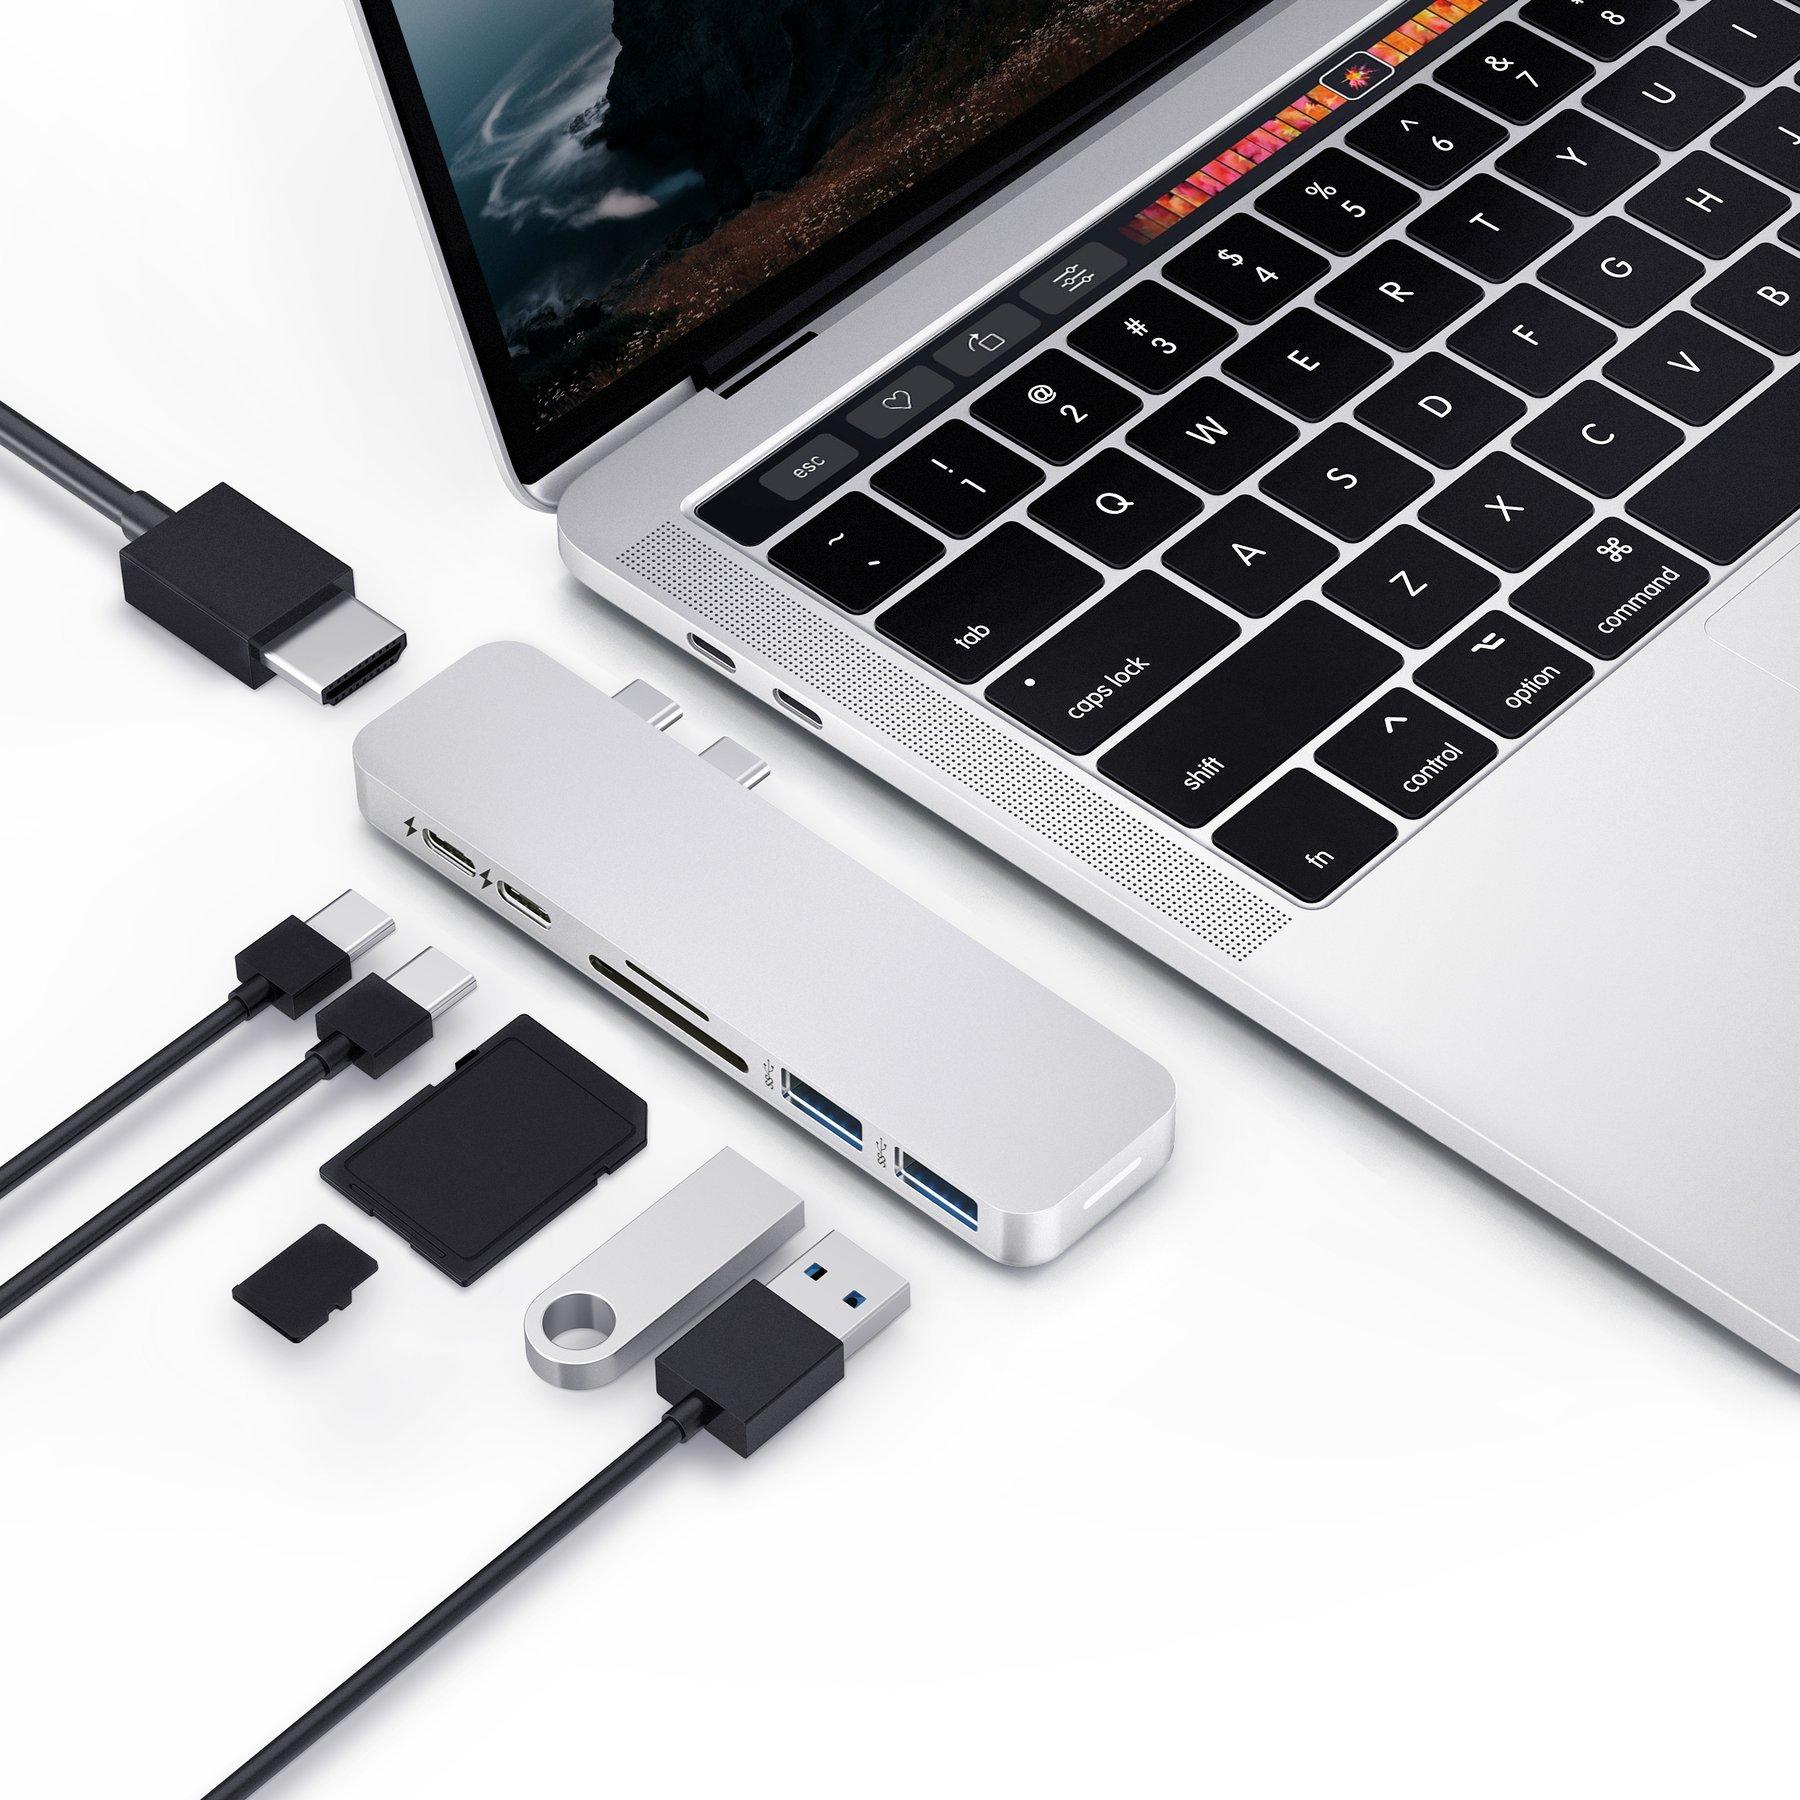 CỔNG CHUYỂN HYPERDRIVE DUO 7-IN-2 USB-C HUB FOR MACBOOK PRO 13″15″/MACBOOK 16″/MACBOOK AIR 13 2018/2019